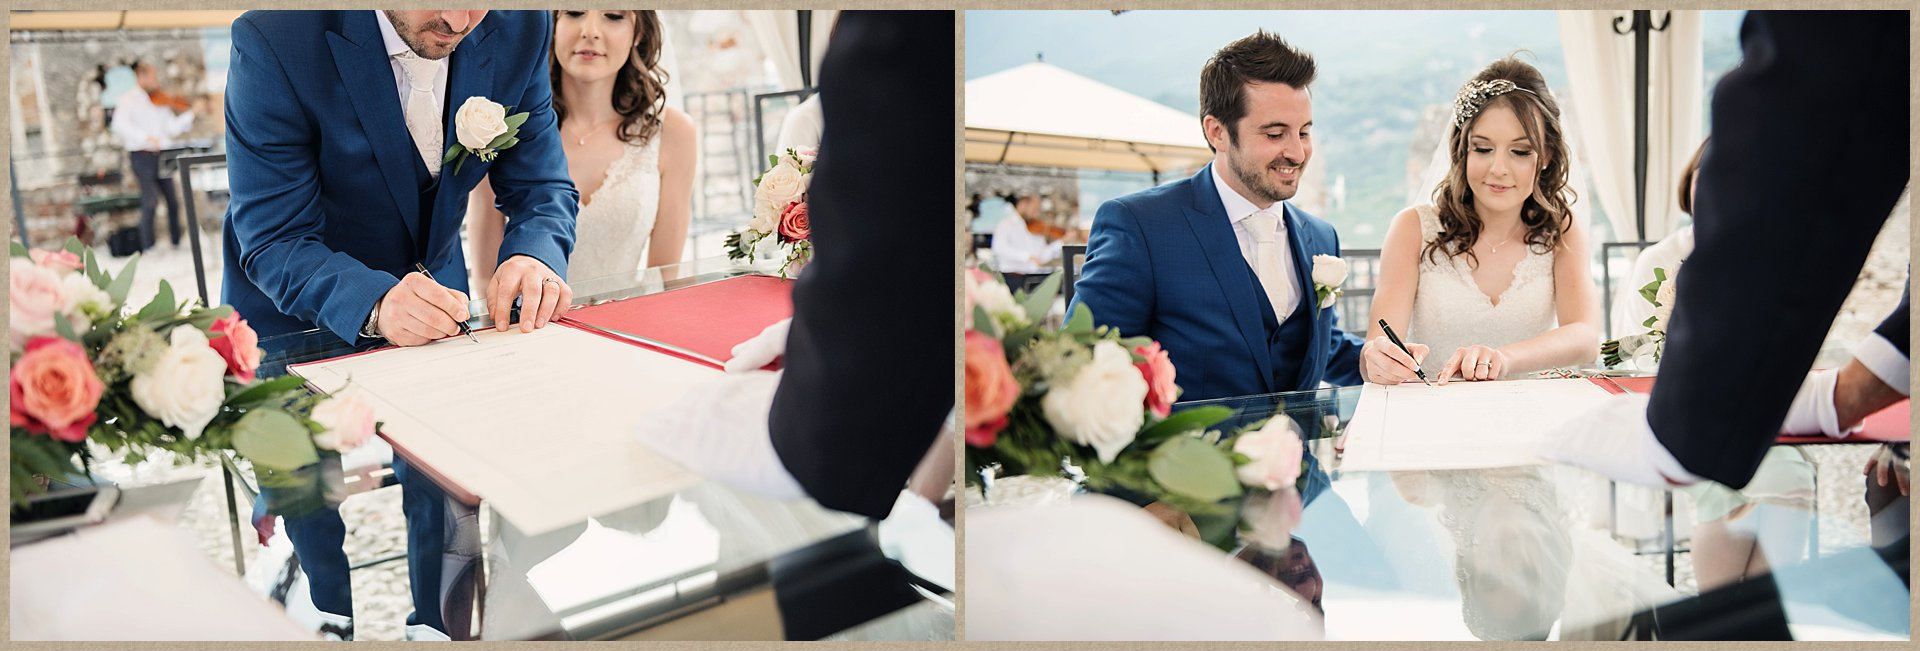 signing the register - Malcesine Castle Wedding